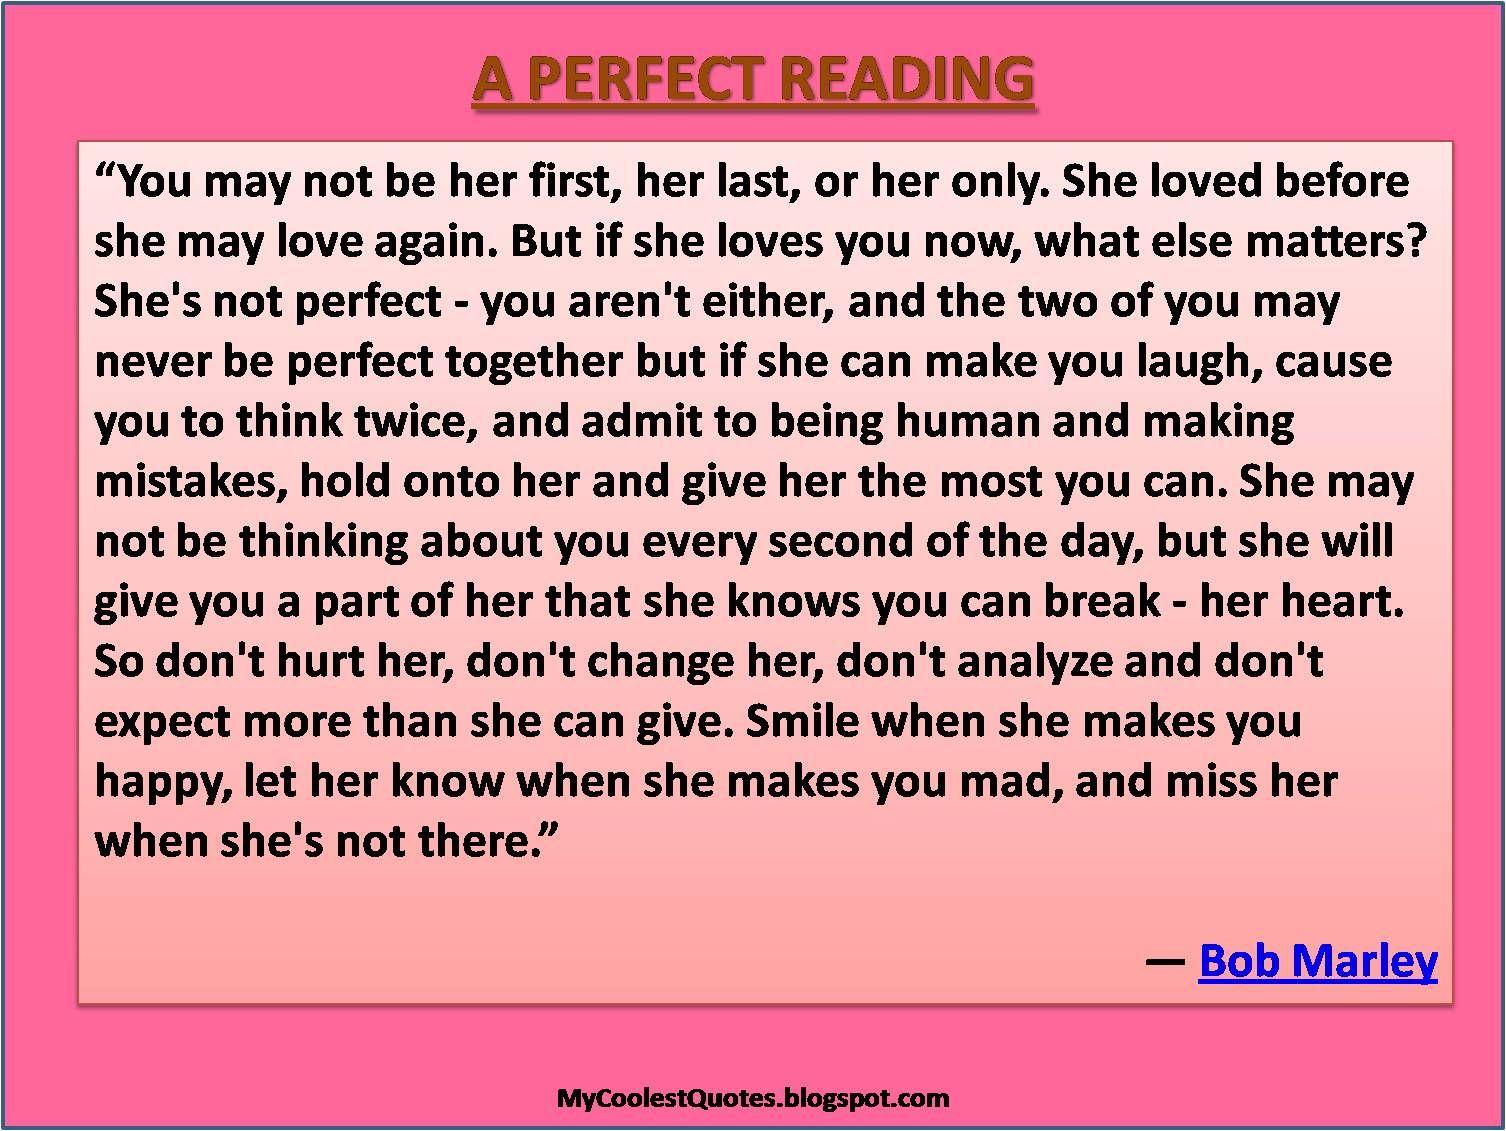 Love Quotes On Valentines Day For Her Topvalentine'sdayquotesaperfectvalentine'sdayreading